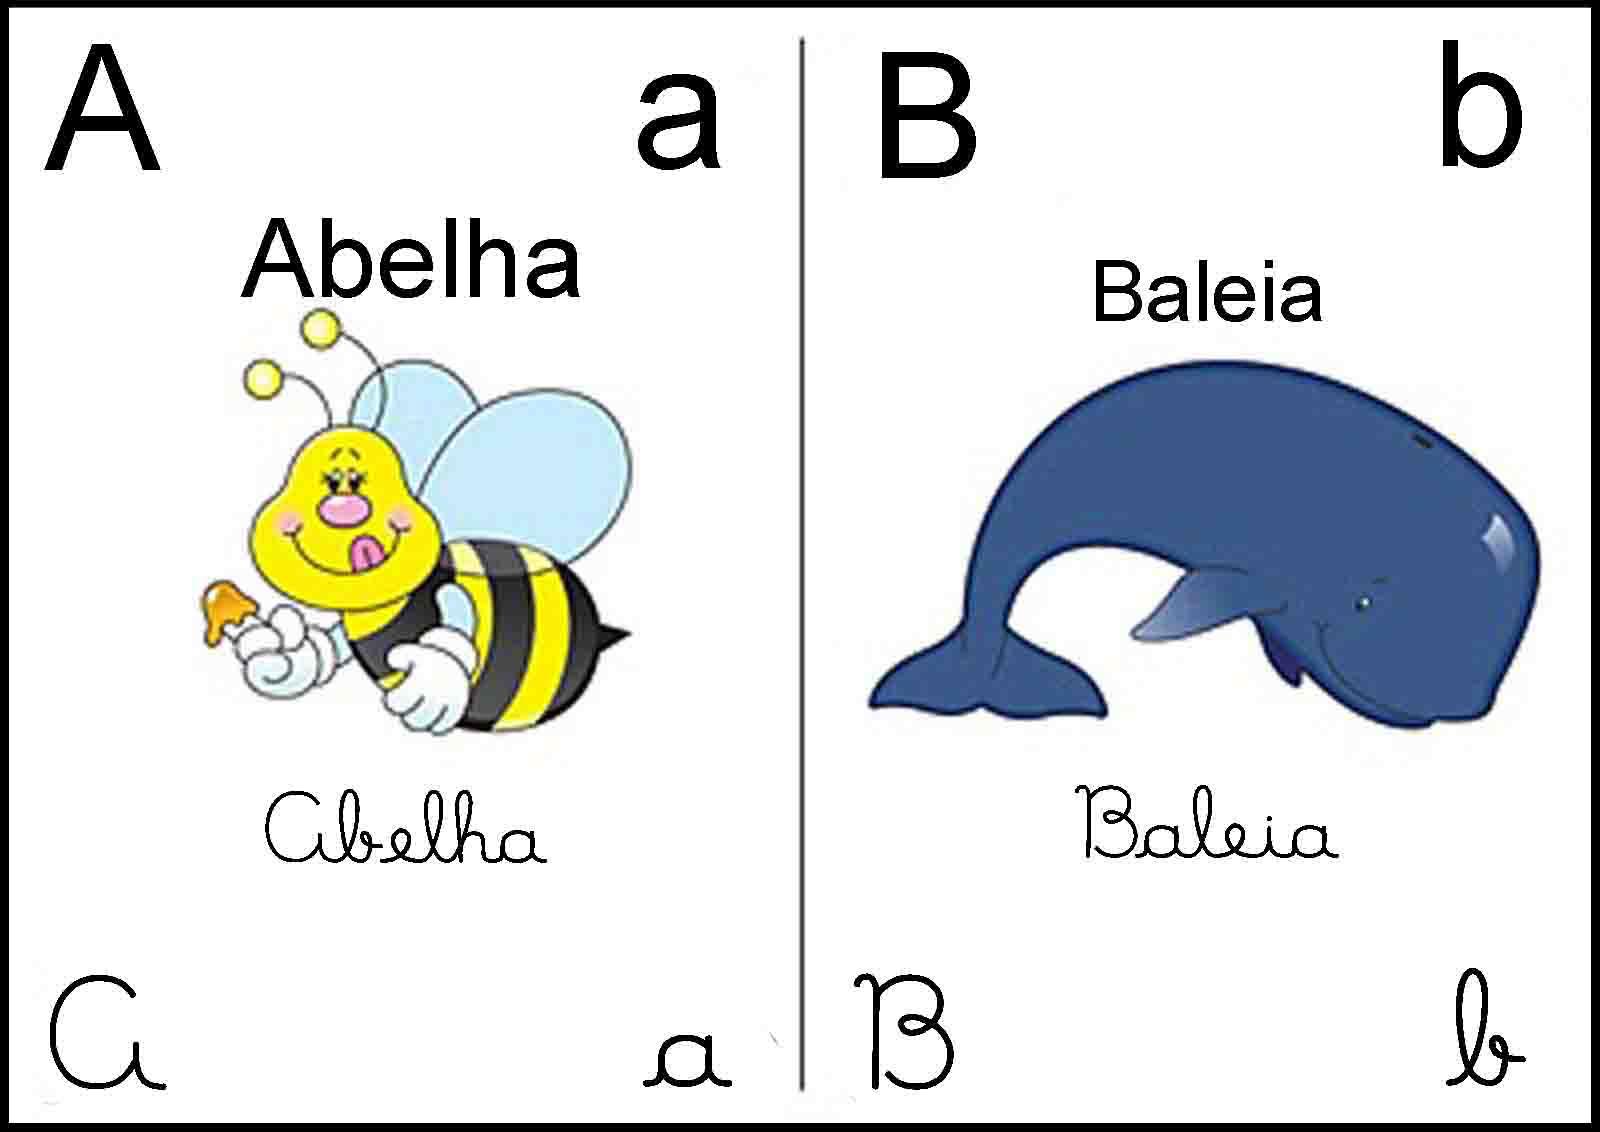 Pequeno Infante Alfabeto Ilustrado -> Desenhos Para Alfabeto Ilustrado